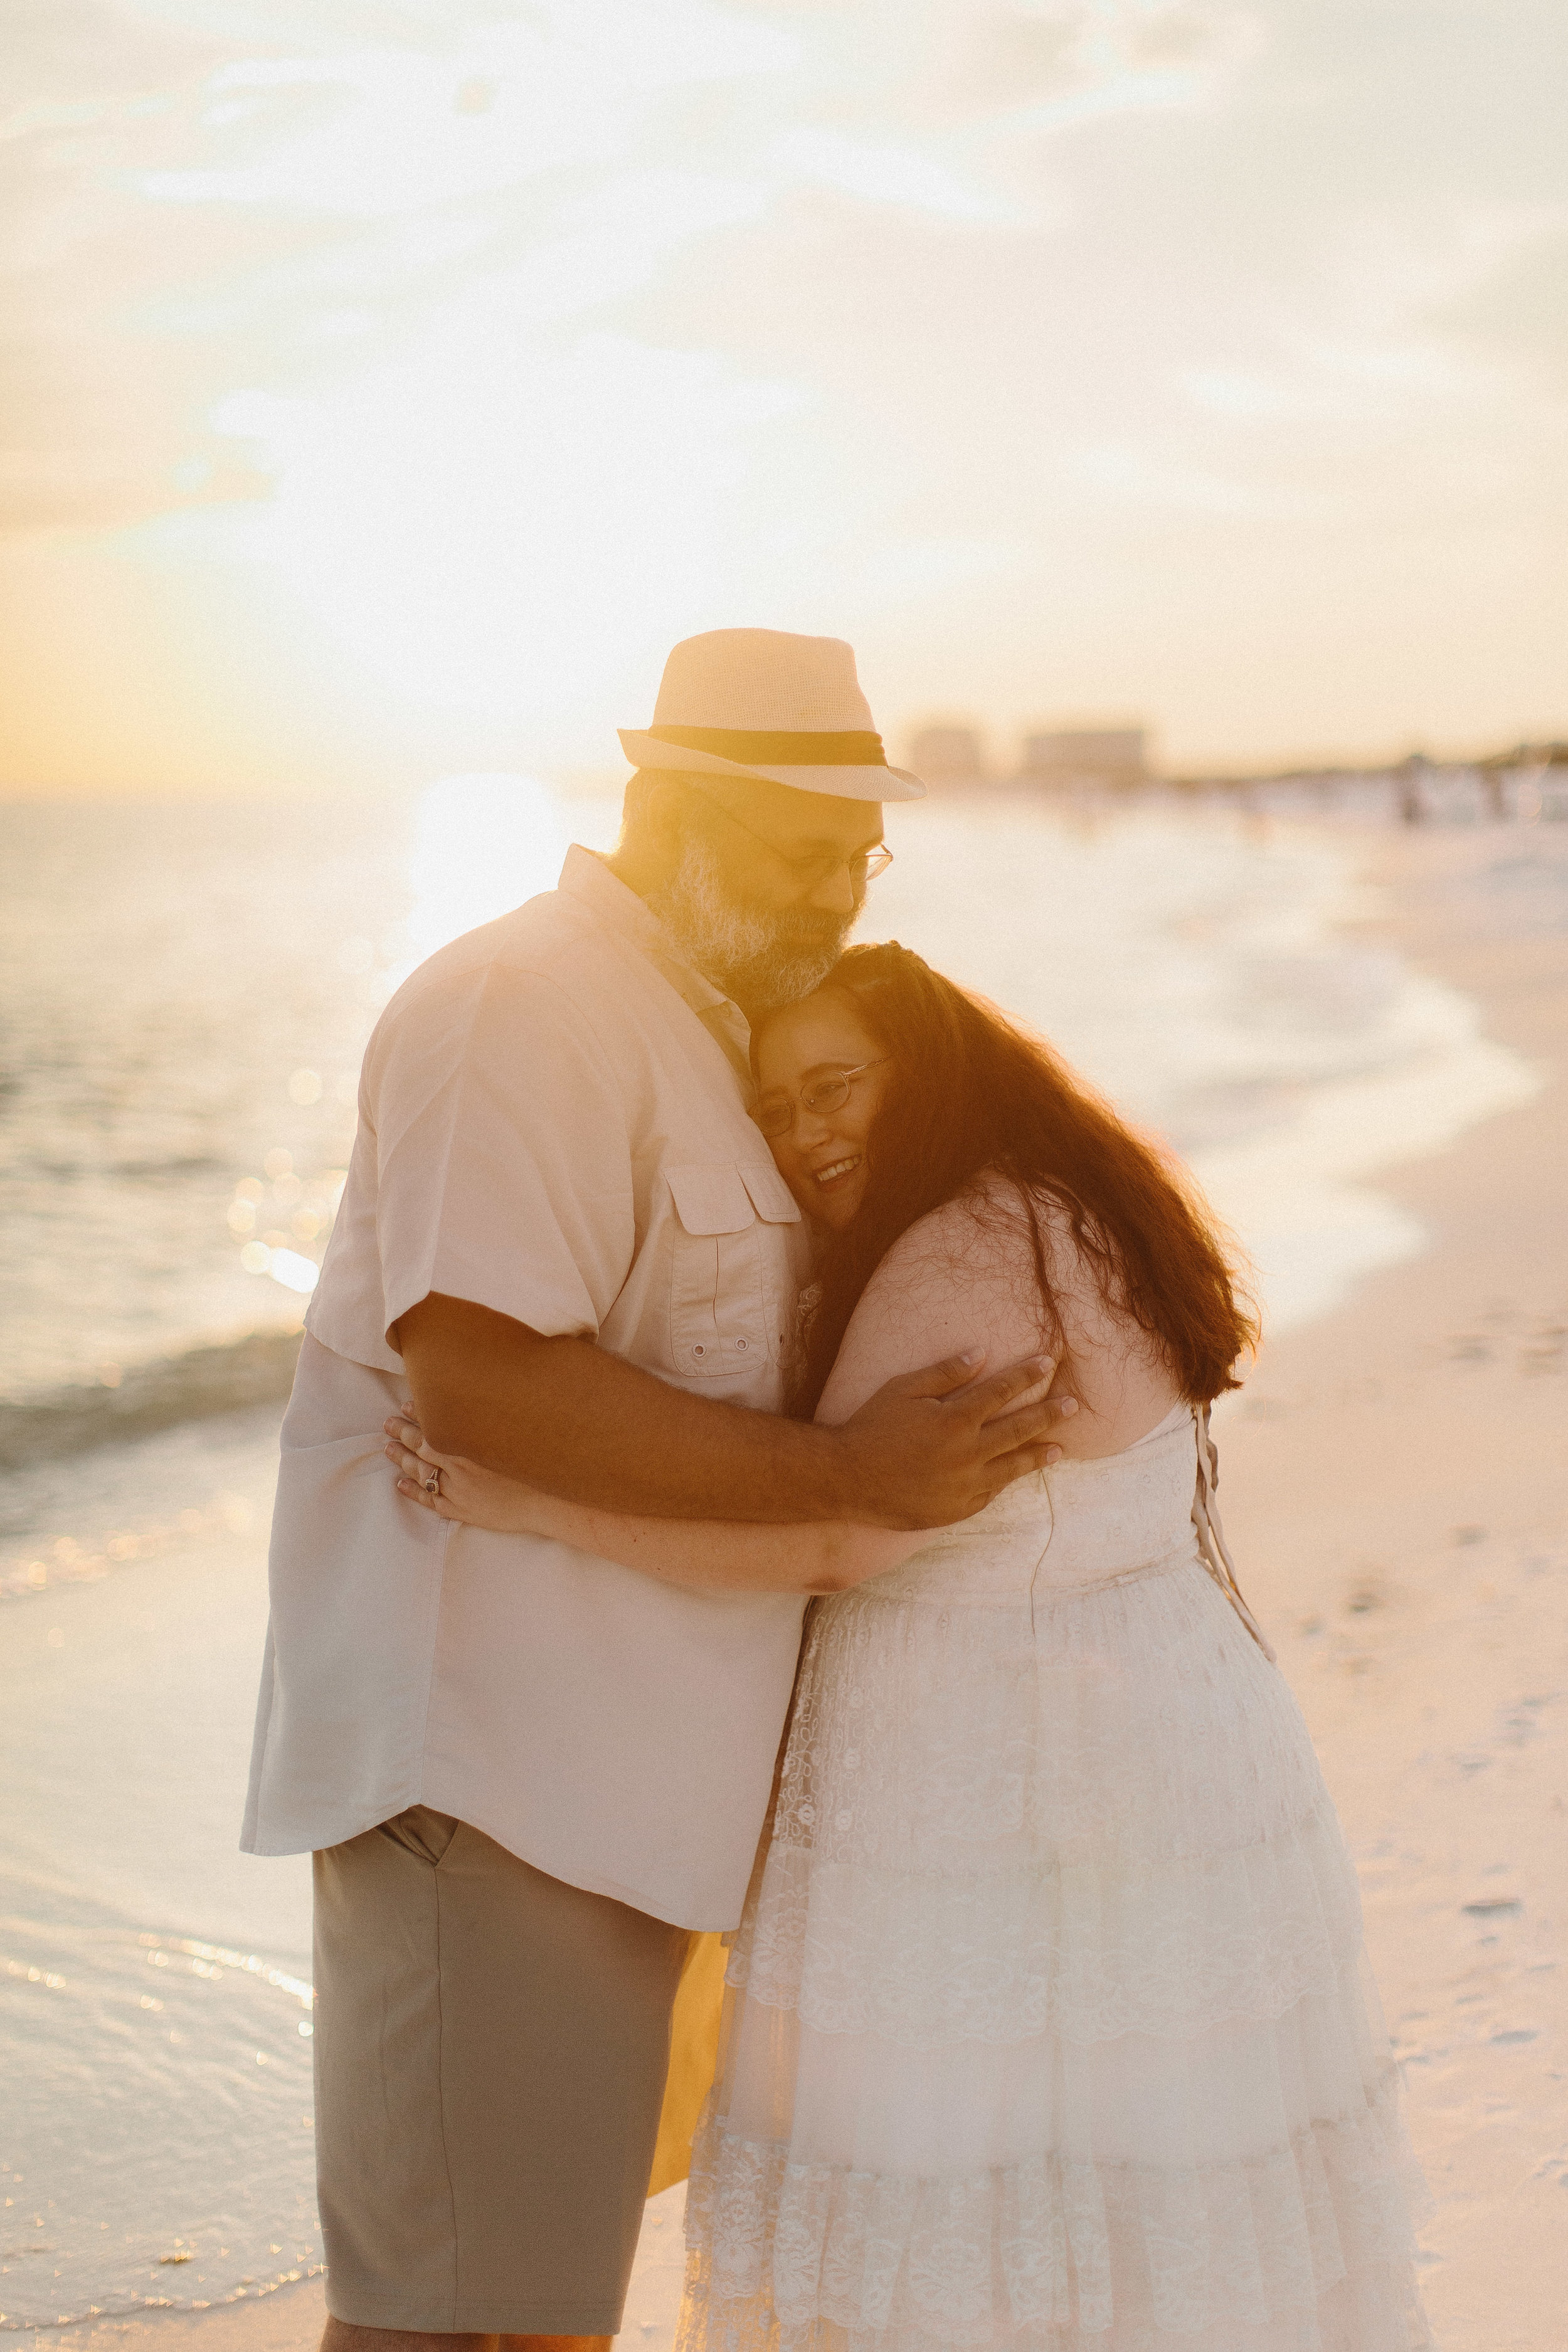 destin_sunset_beach_elopement_intimate_wedding_photographer_florida_documentary_1279.jpg